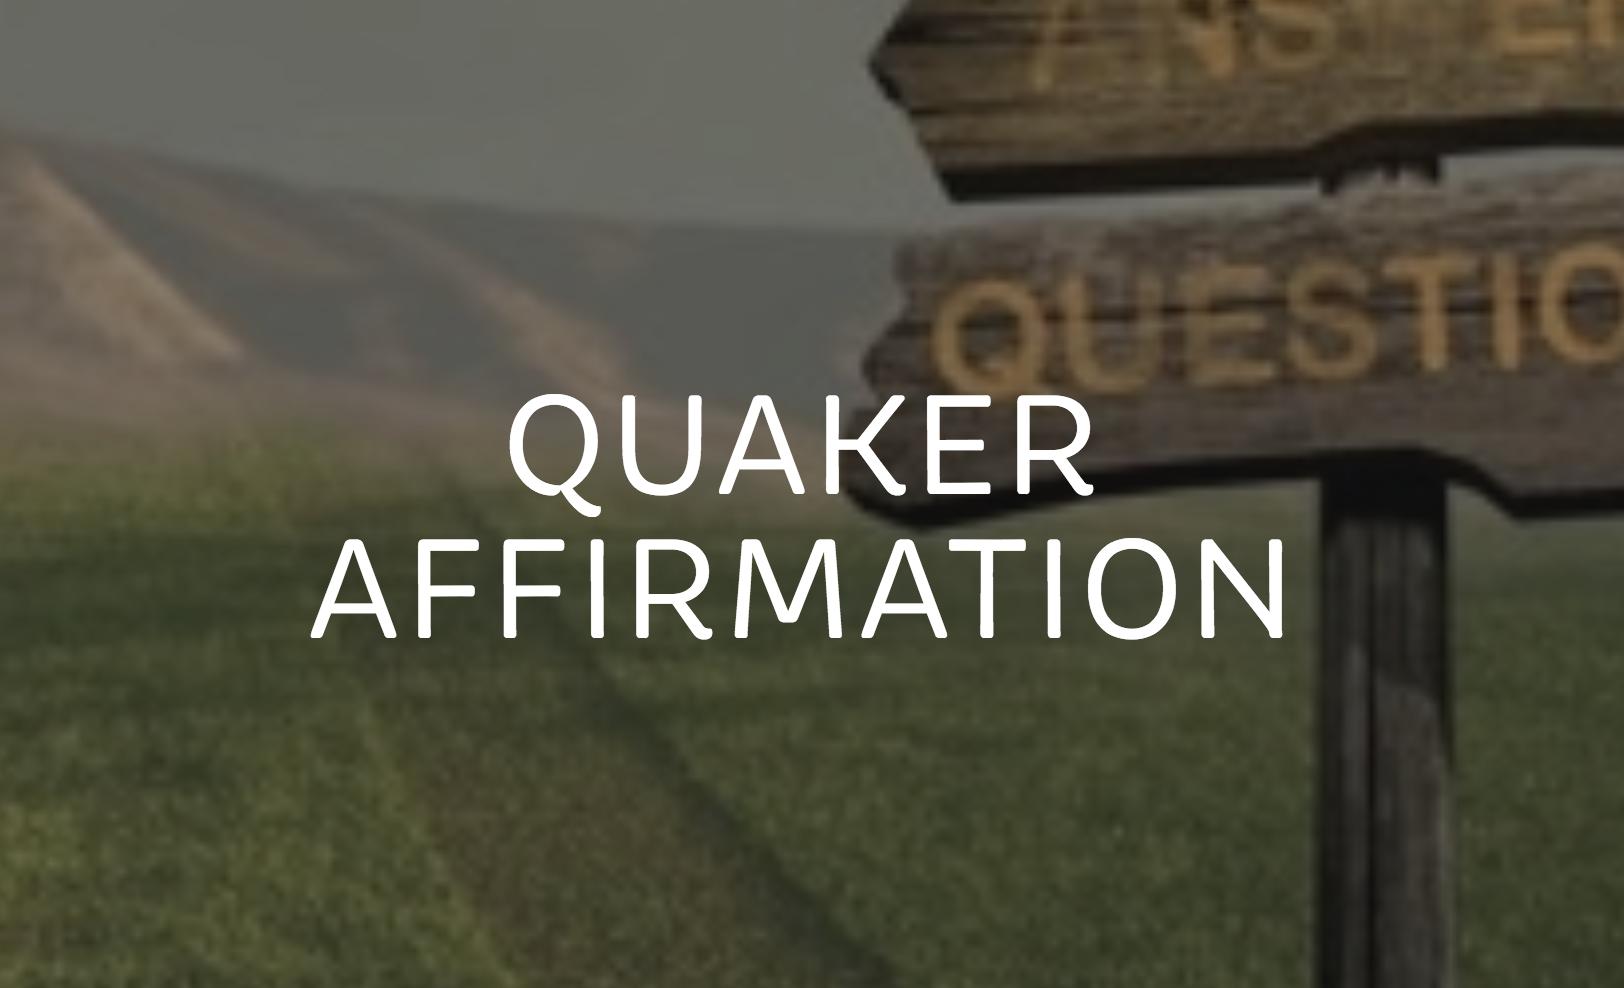 Quaker Affirmation: